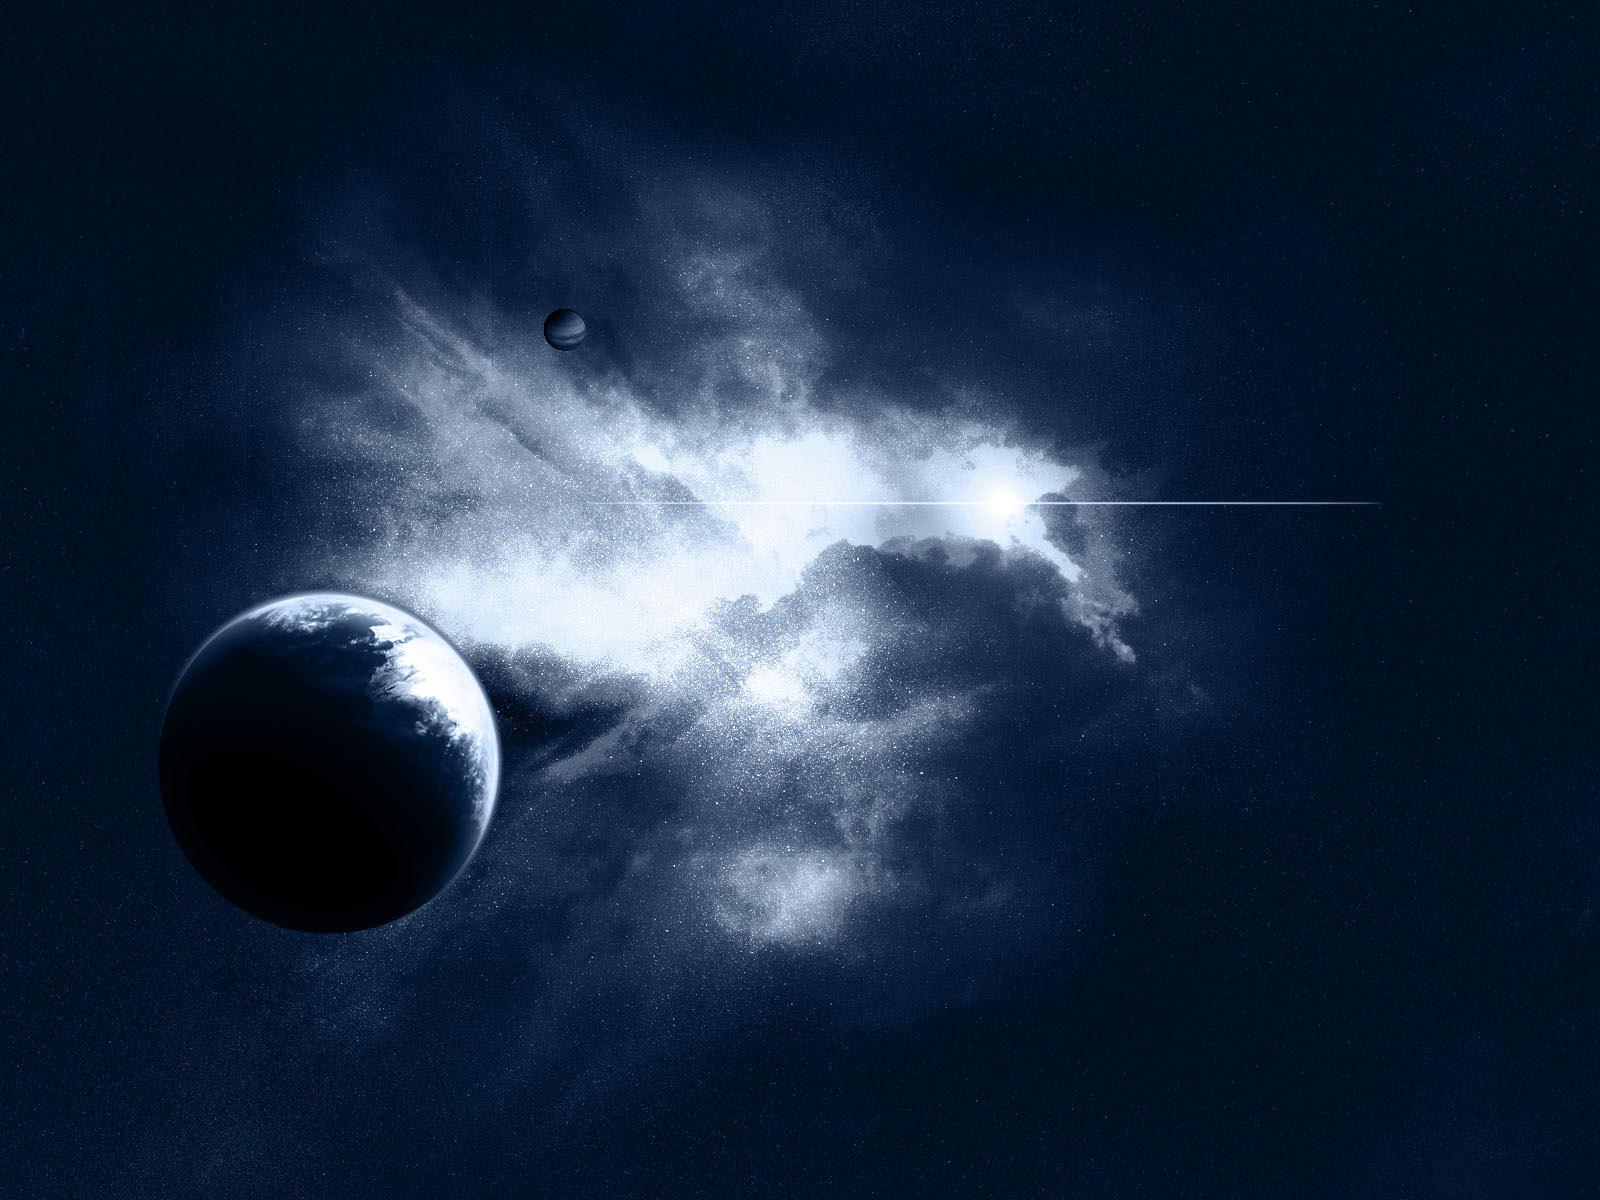 http://3.bp.blogspot.com/-BQc3SNSOf0w/Td3q97ZdKEI/AAAAAAAAAUg/ezo3xy9zQdY/s1600/abstract_planet-normal.jpg